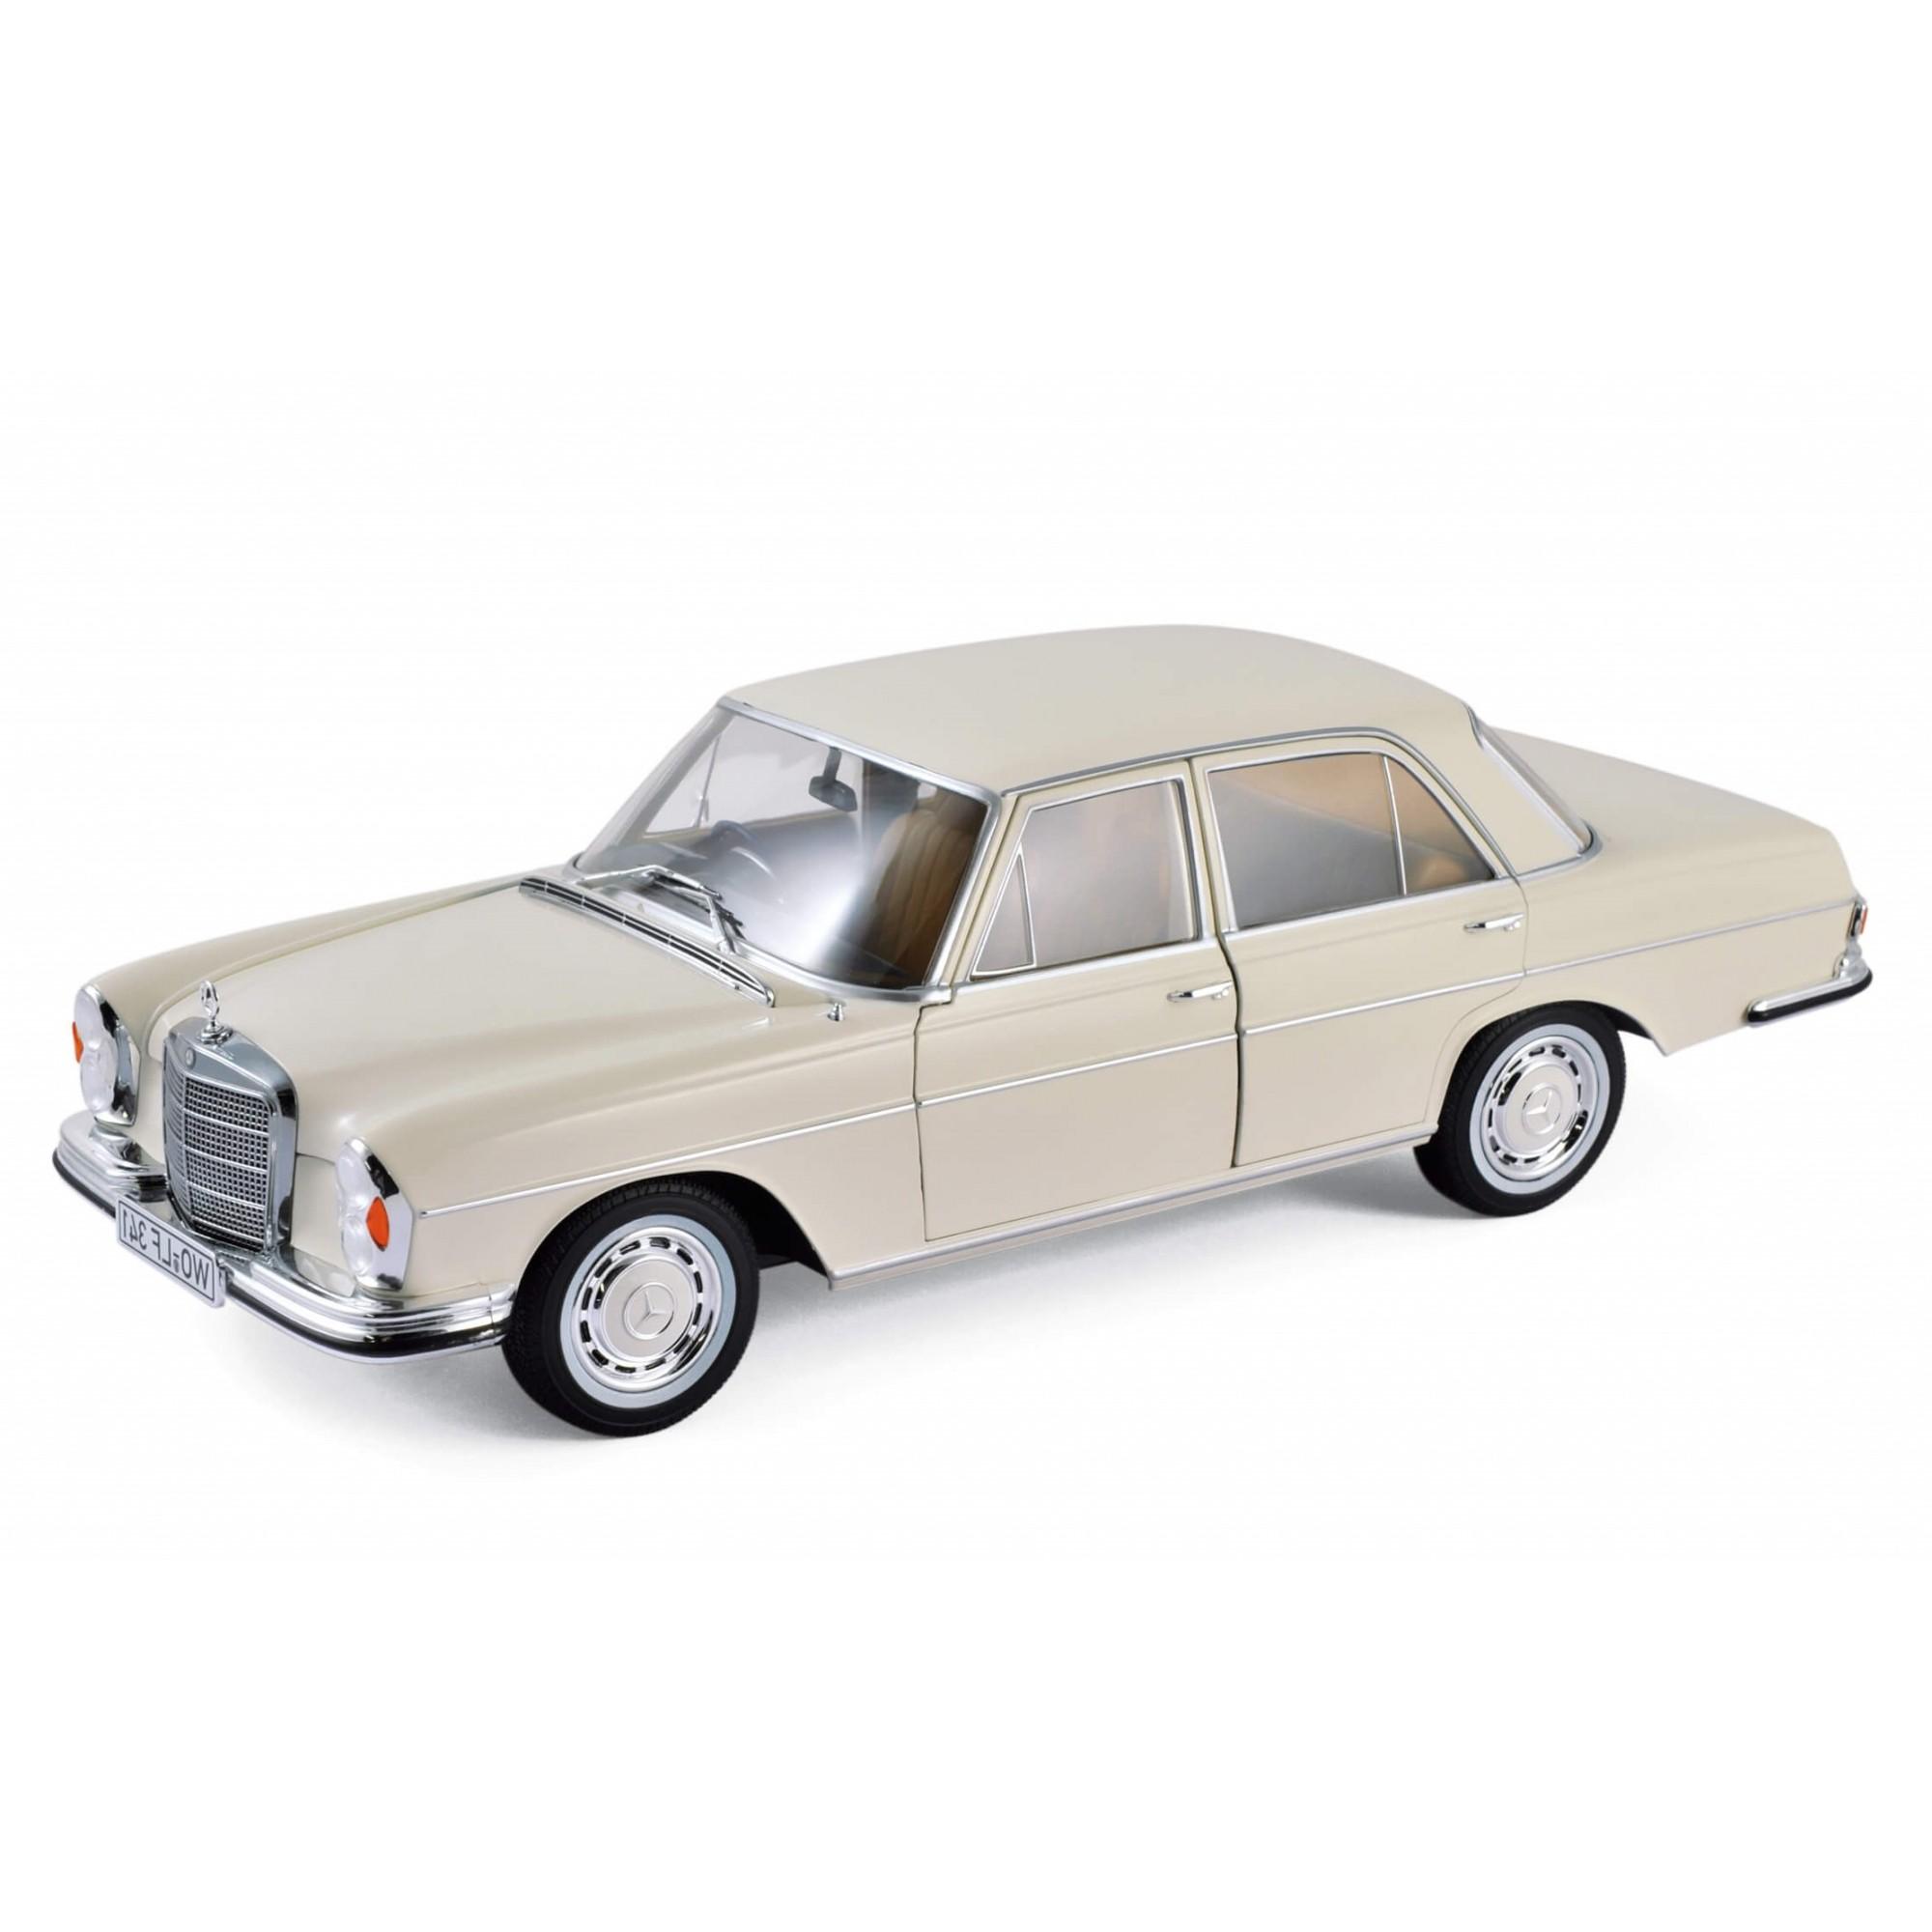 Miniatura Mercedes Benz 280 SE 1968 1/18 Norev